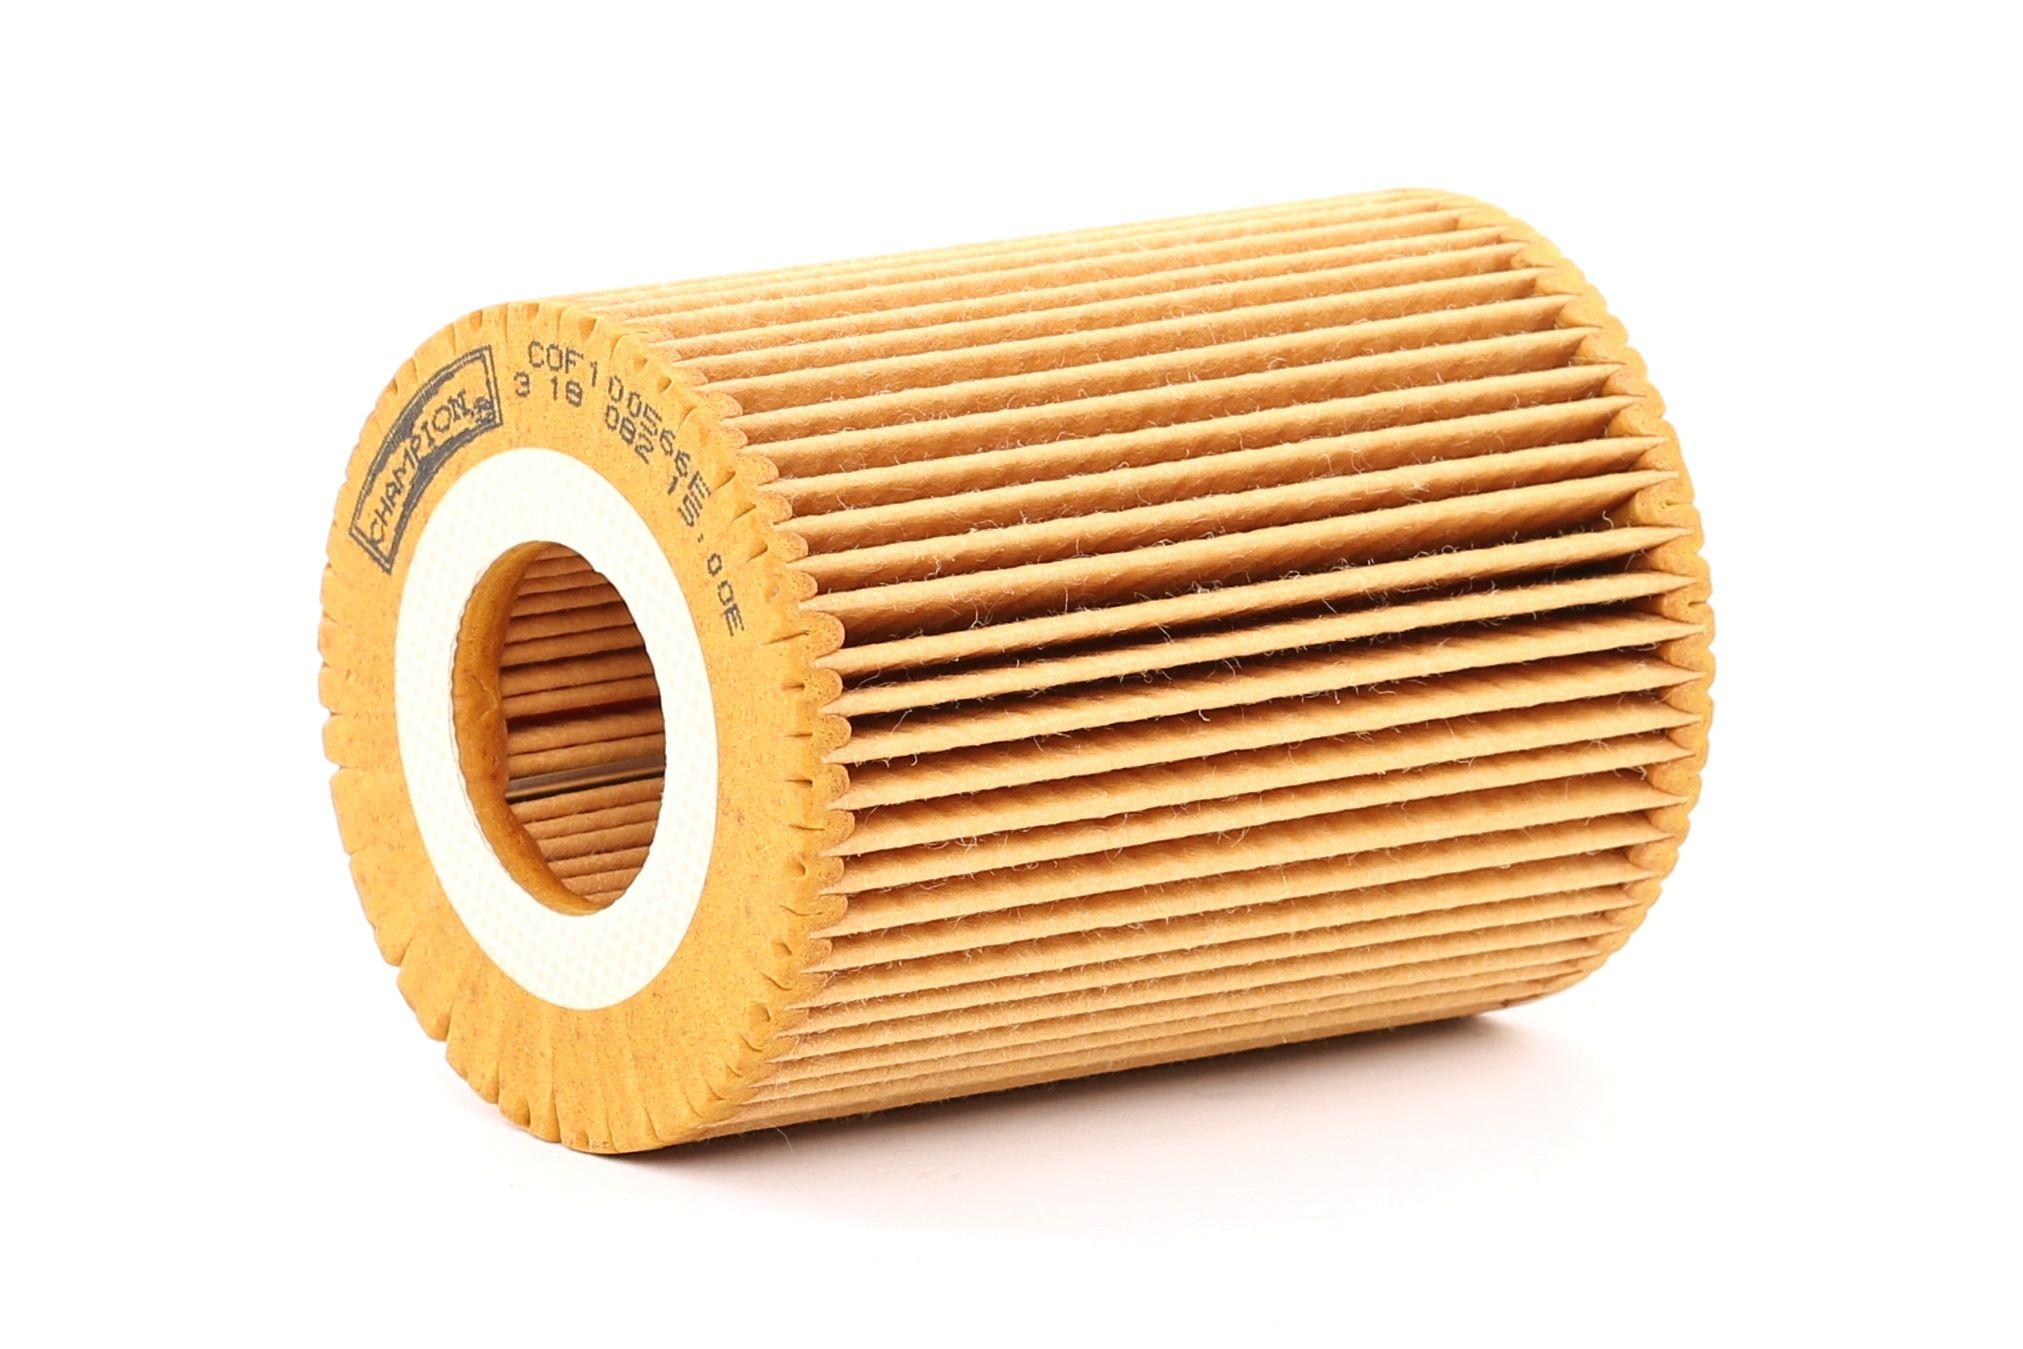 COF100566E CHAMPION EON TITAN Filtereinsatz Innendurchmesser: 30mm, Ø: 72mm, Höhe: 95mm Ölfilter COF100566E günstig kaufen